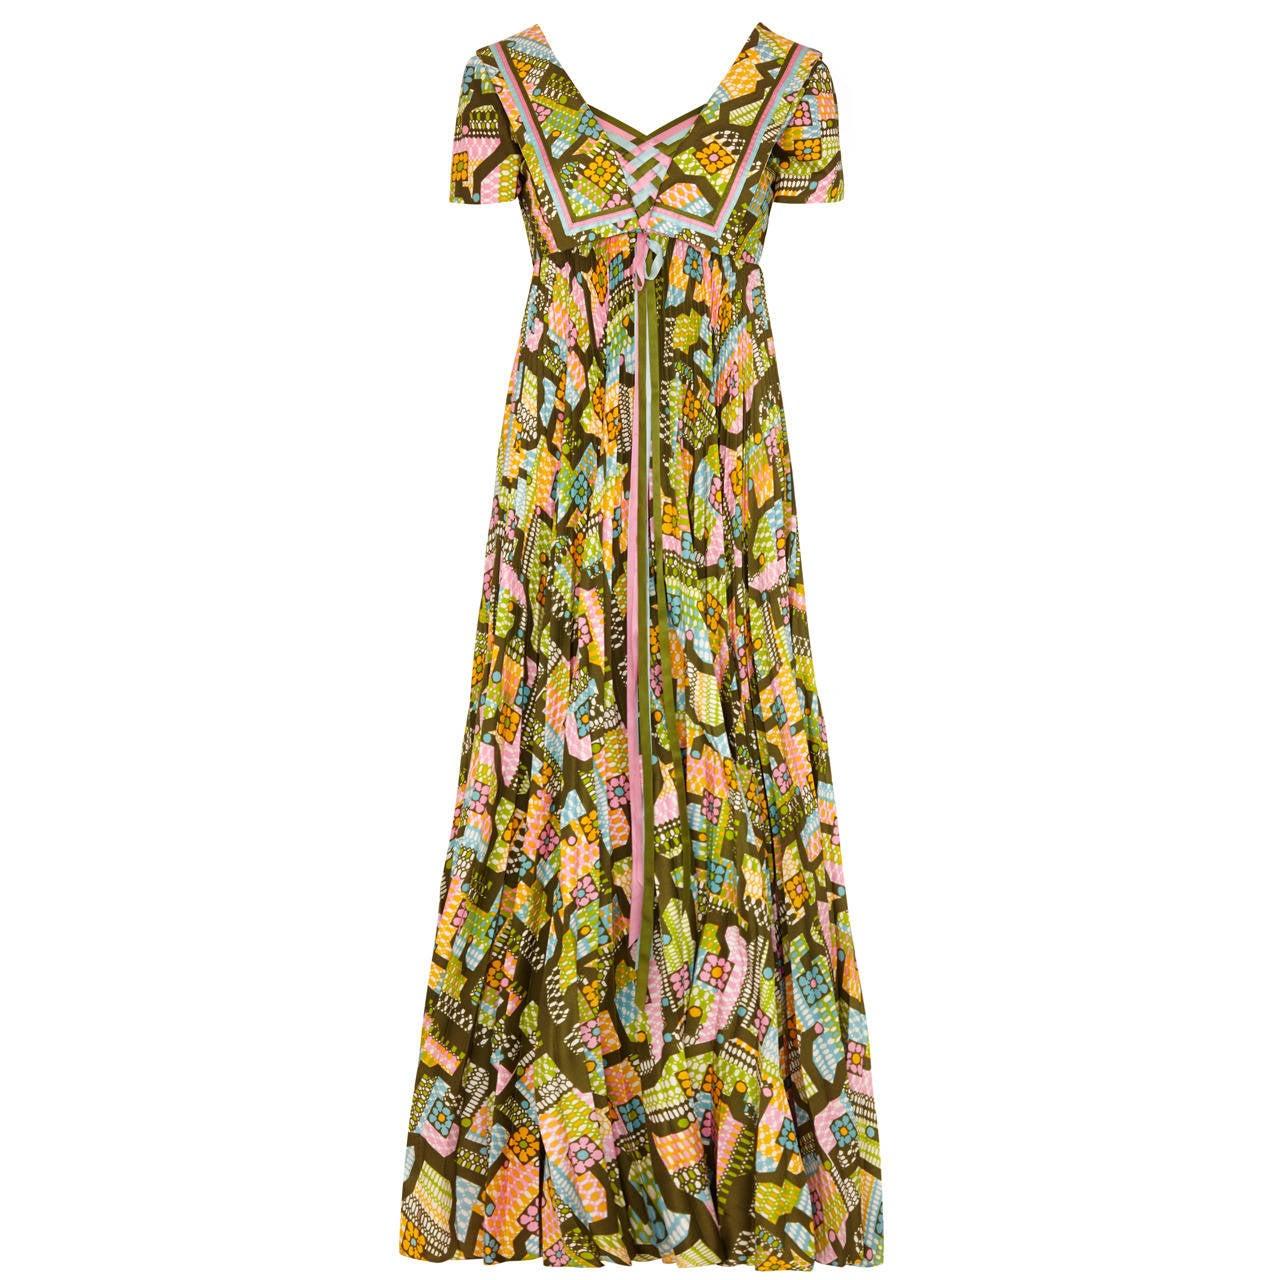 1970s Hardy Amies Pleated Maxi Dress